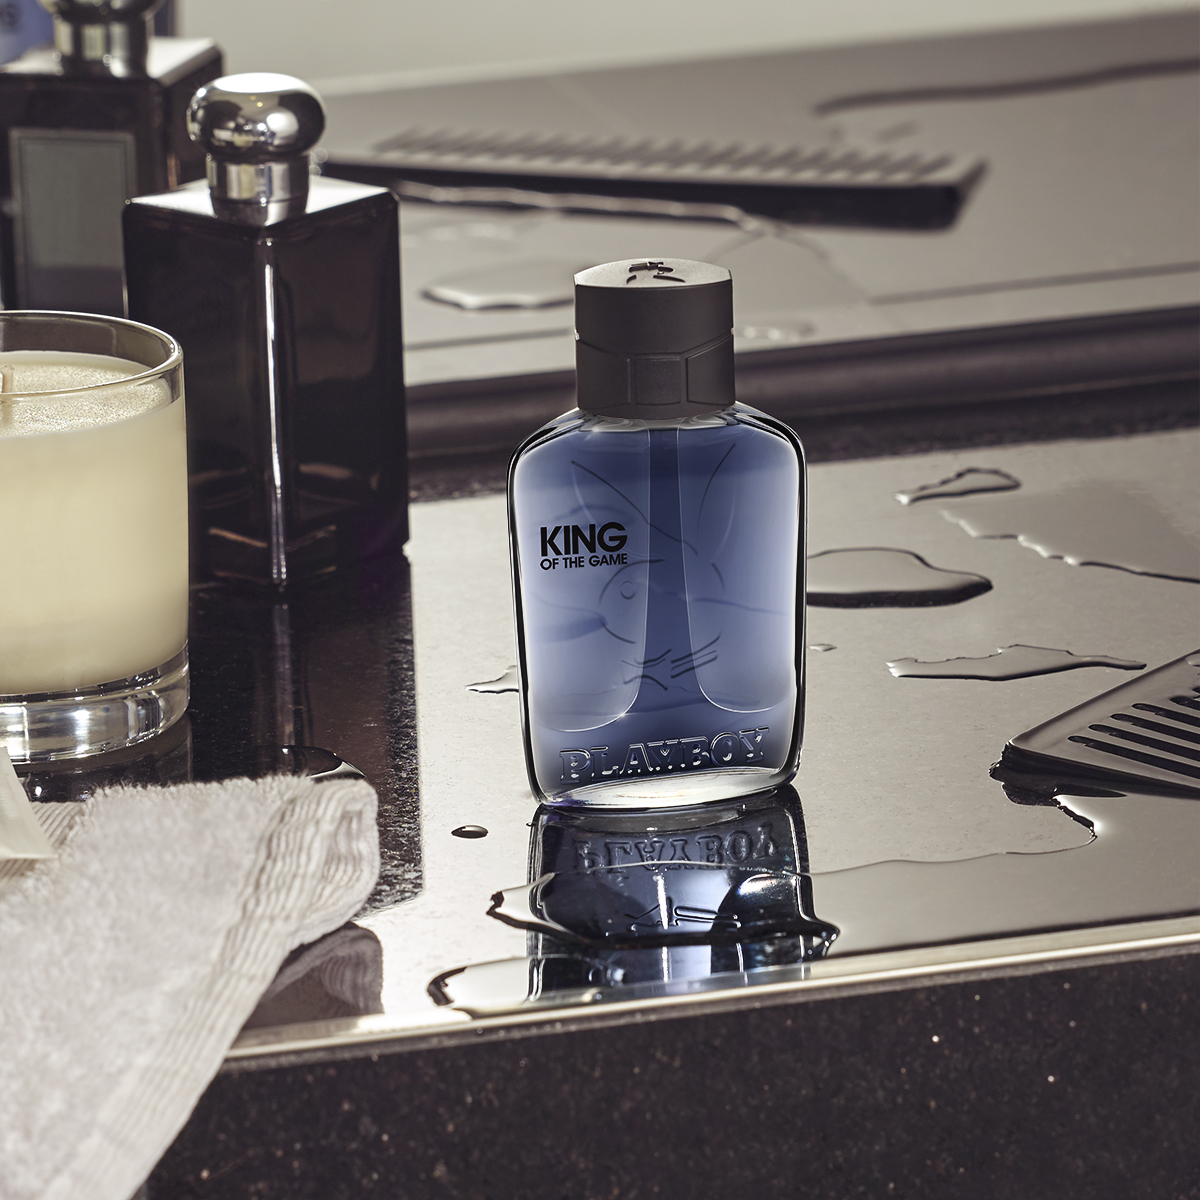 26-07-17 playboy perfumes18434.jpg